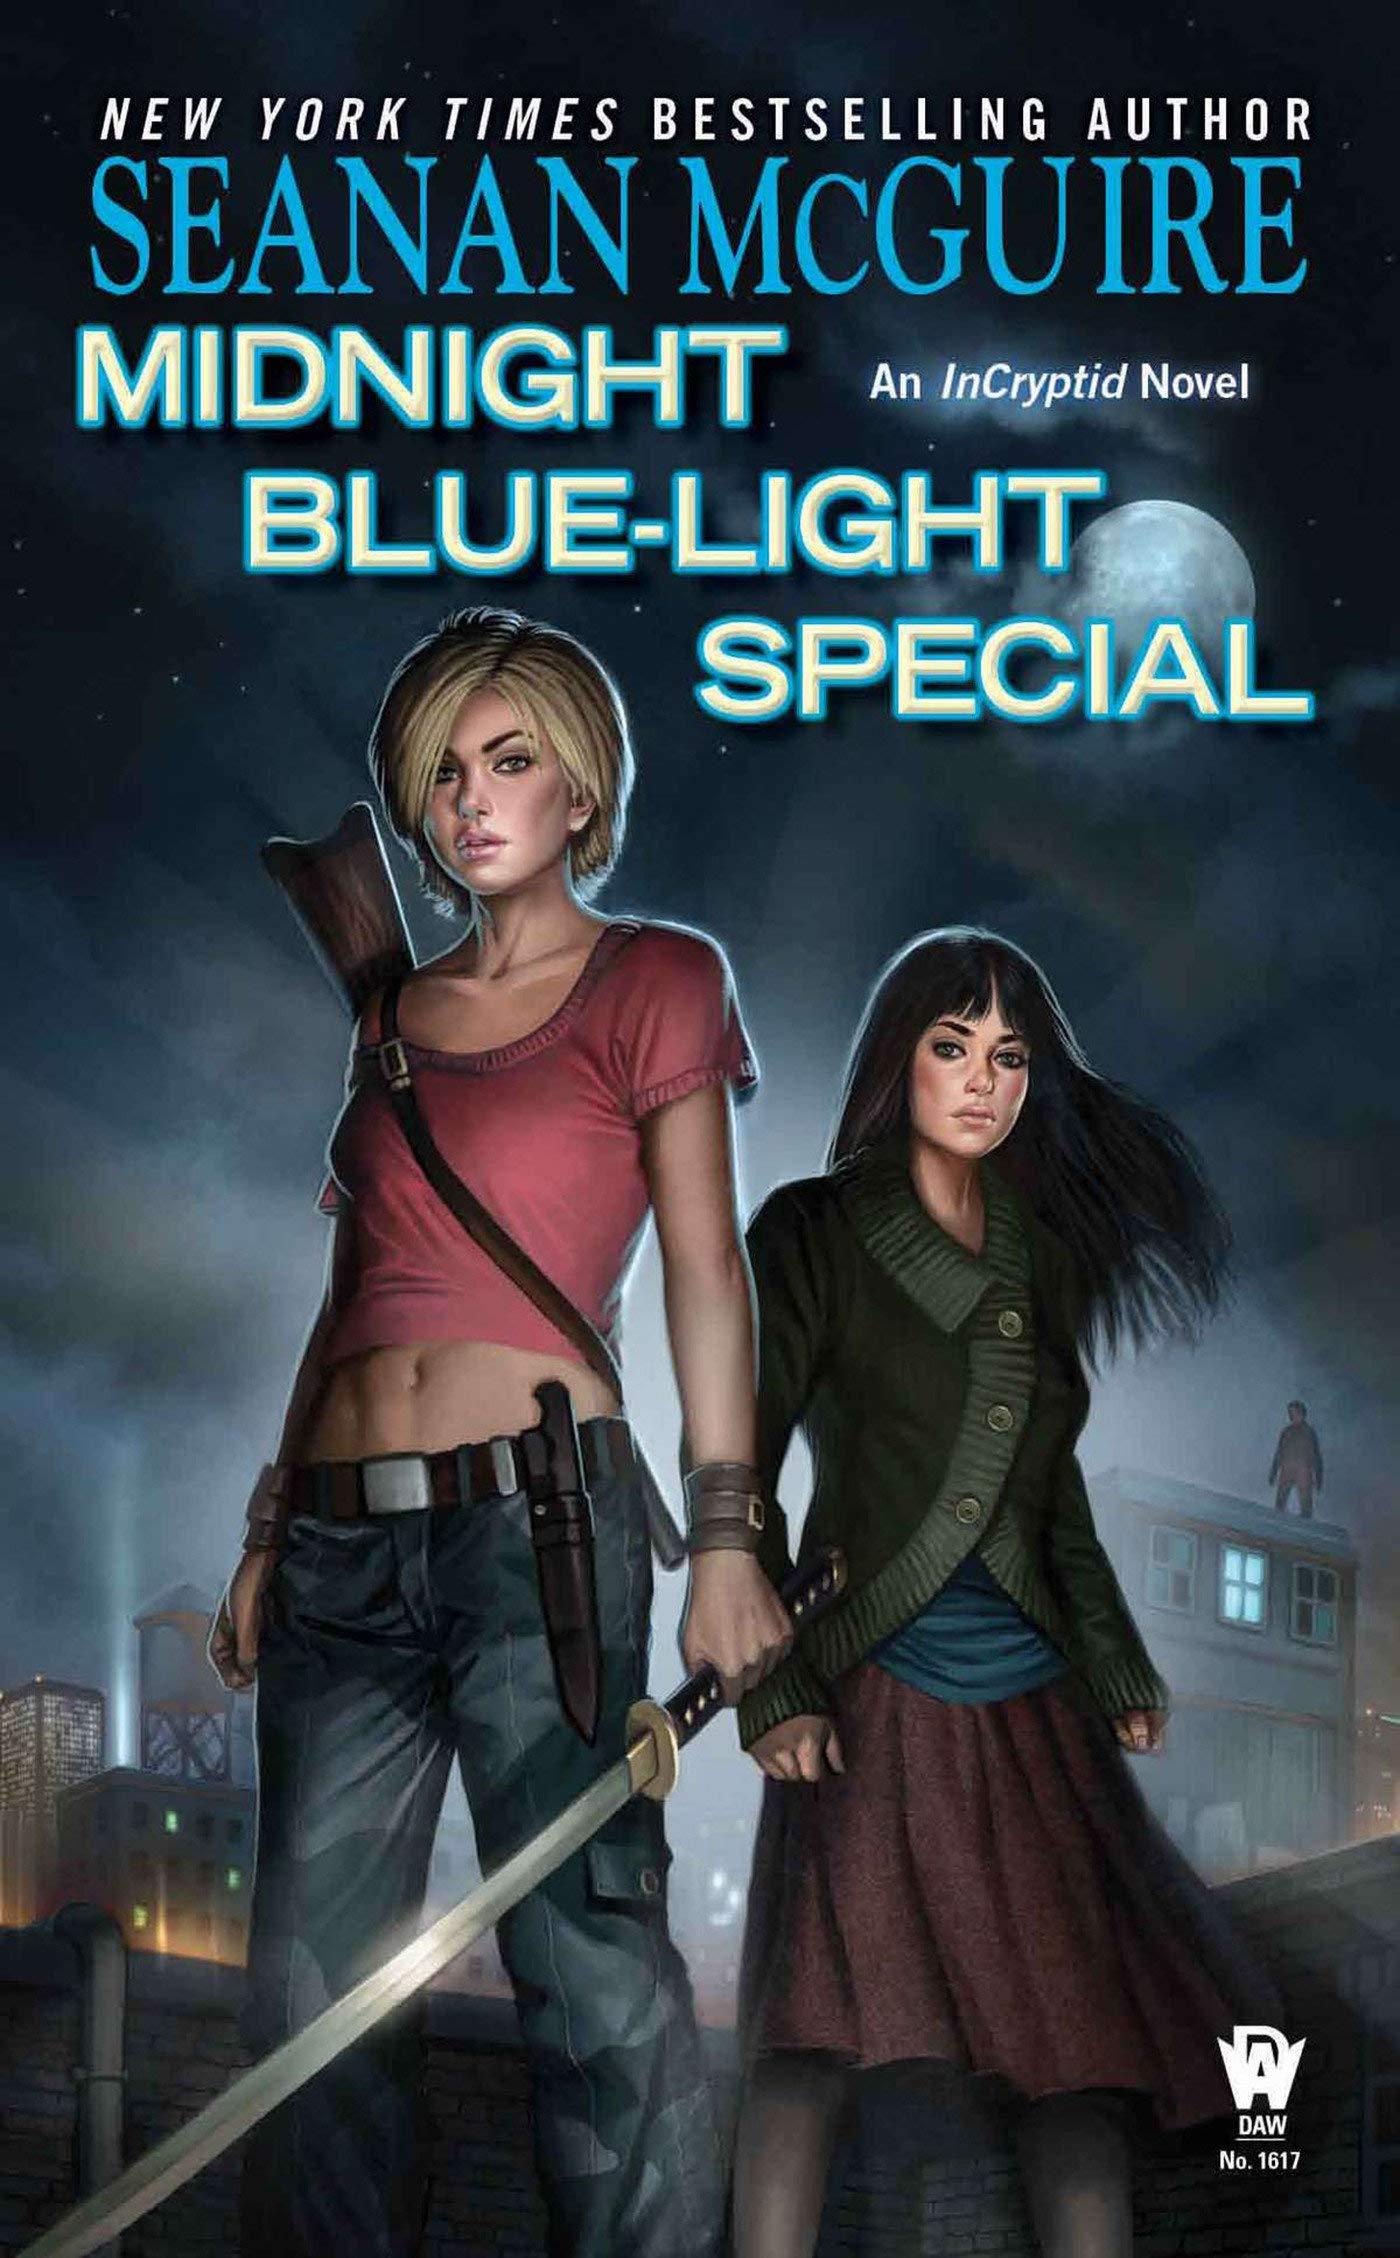 midnight blue light special mcguire seanan